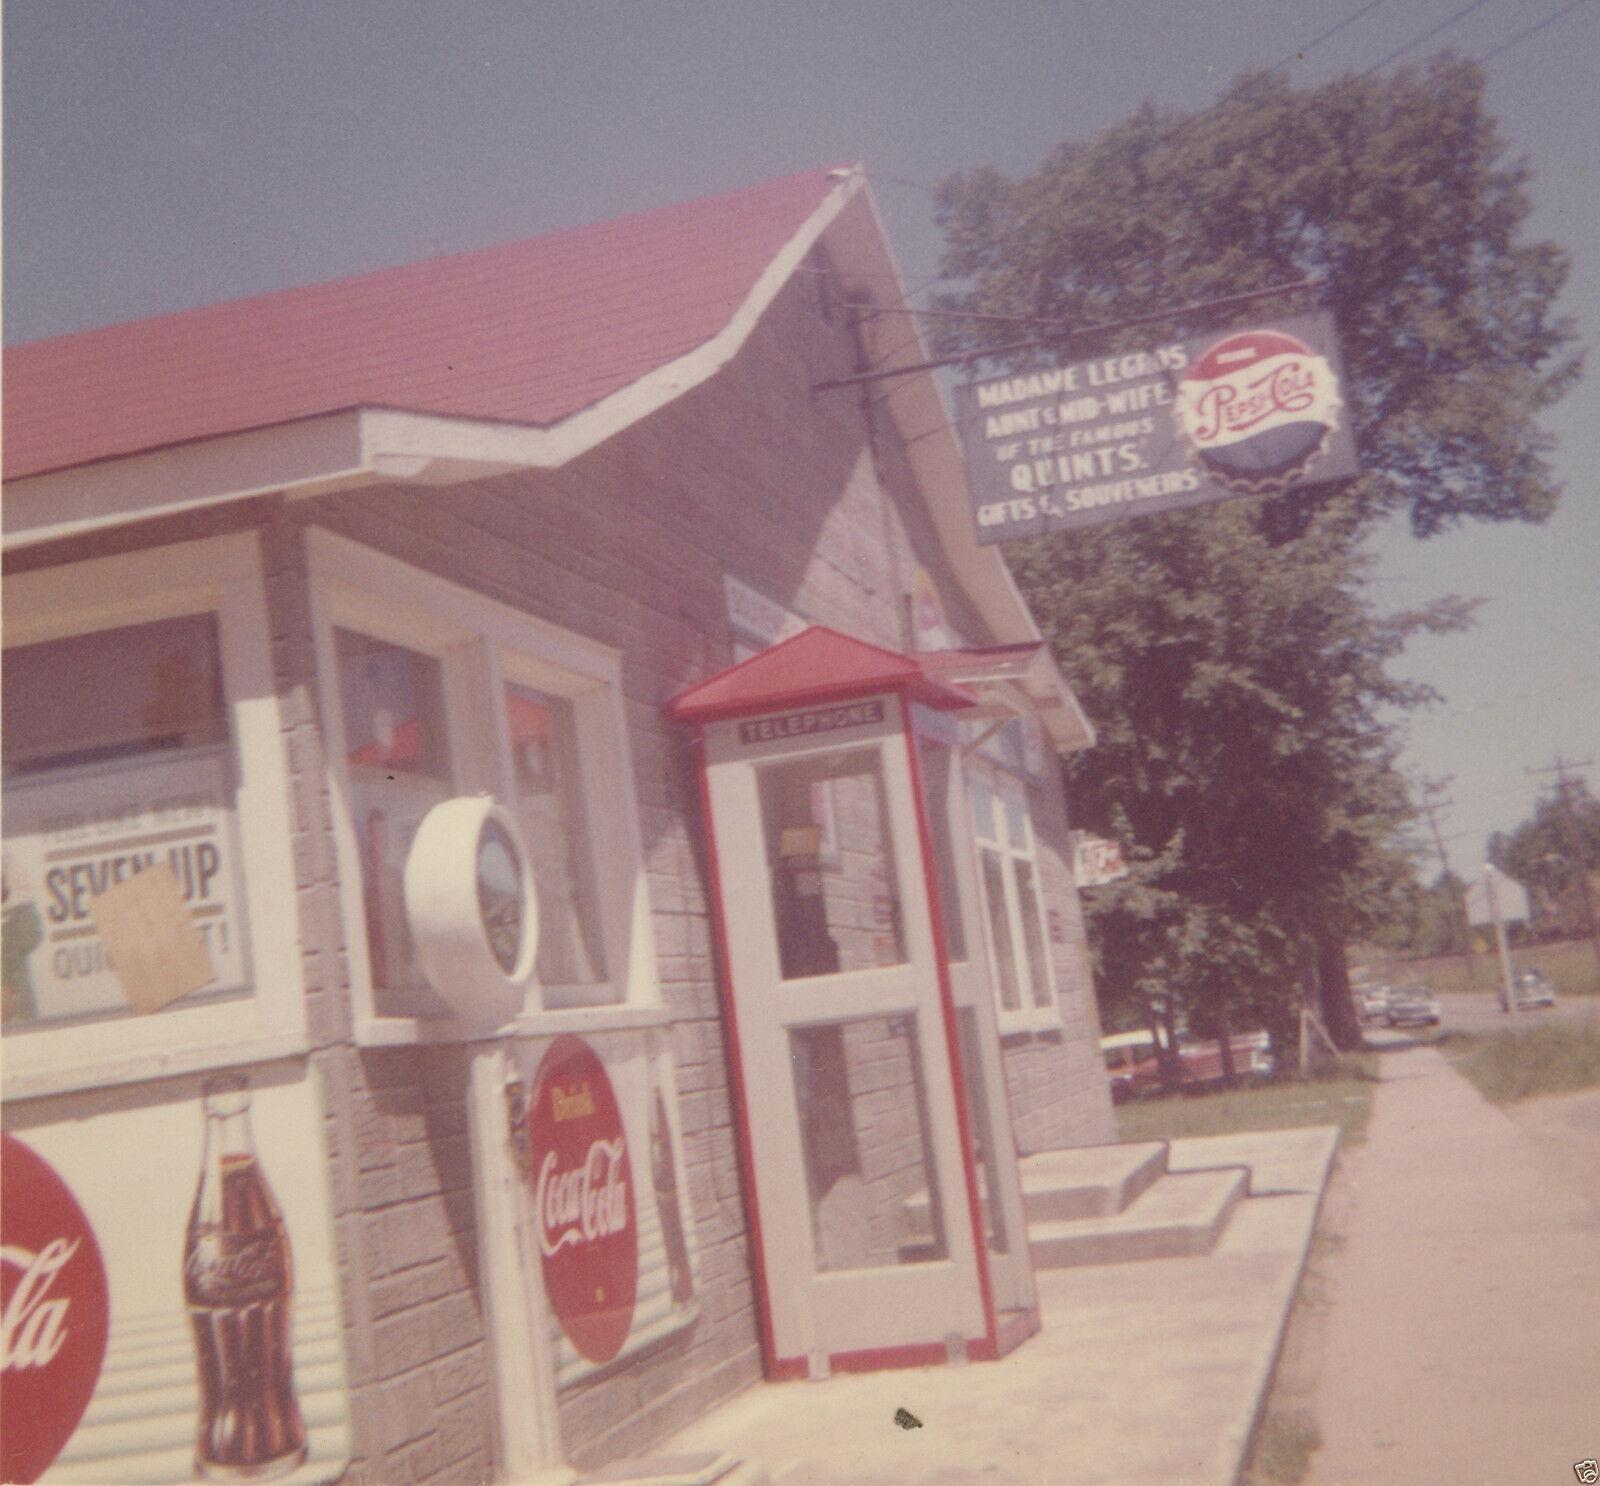 VINTAGE 1962 COCA COLA VS PEPSI PHONE BOOTH MADAME LEGROS ROADSIDE SIGNS PHOTO   [ ]